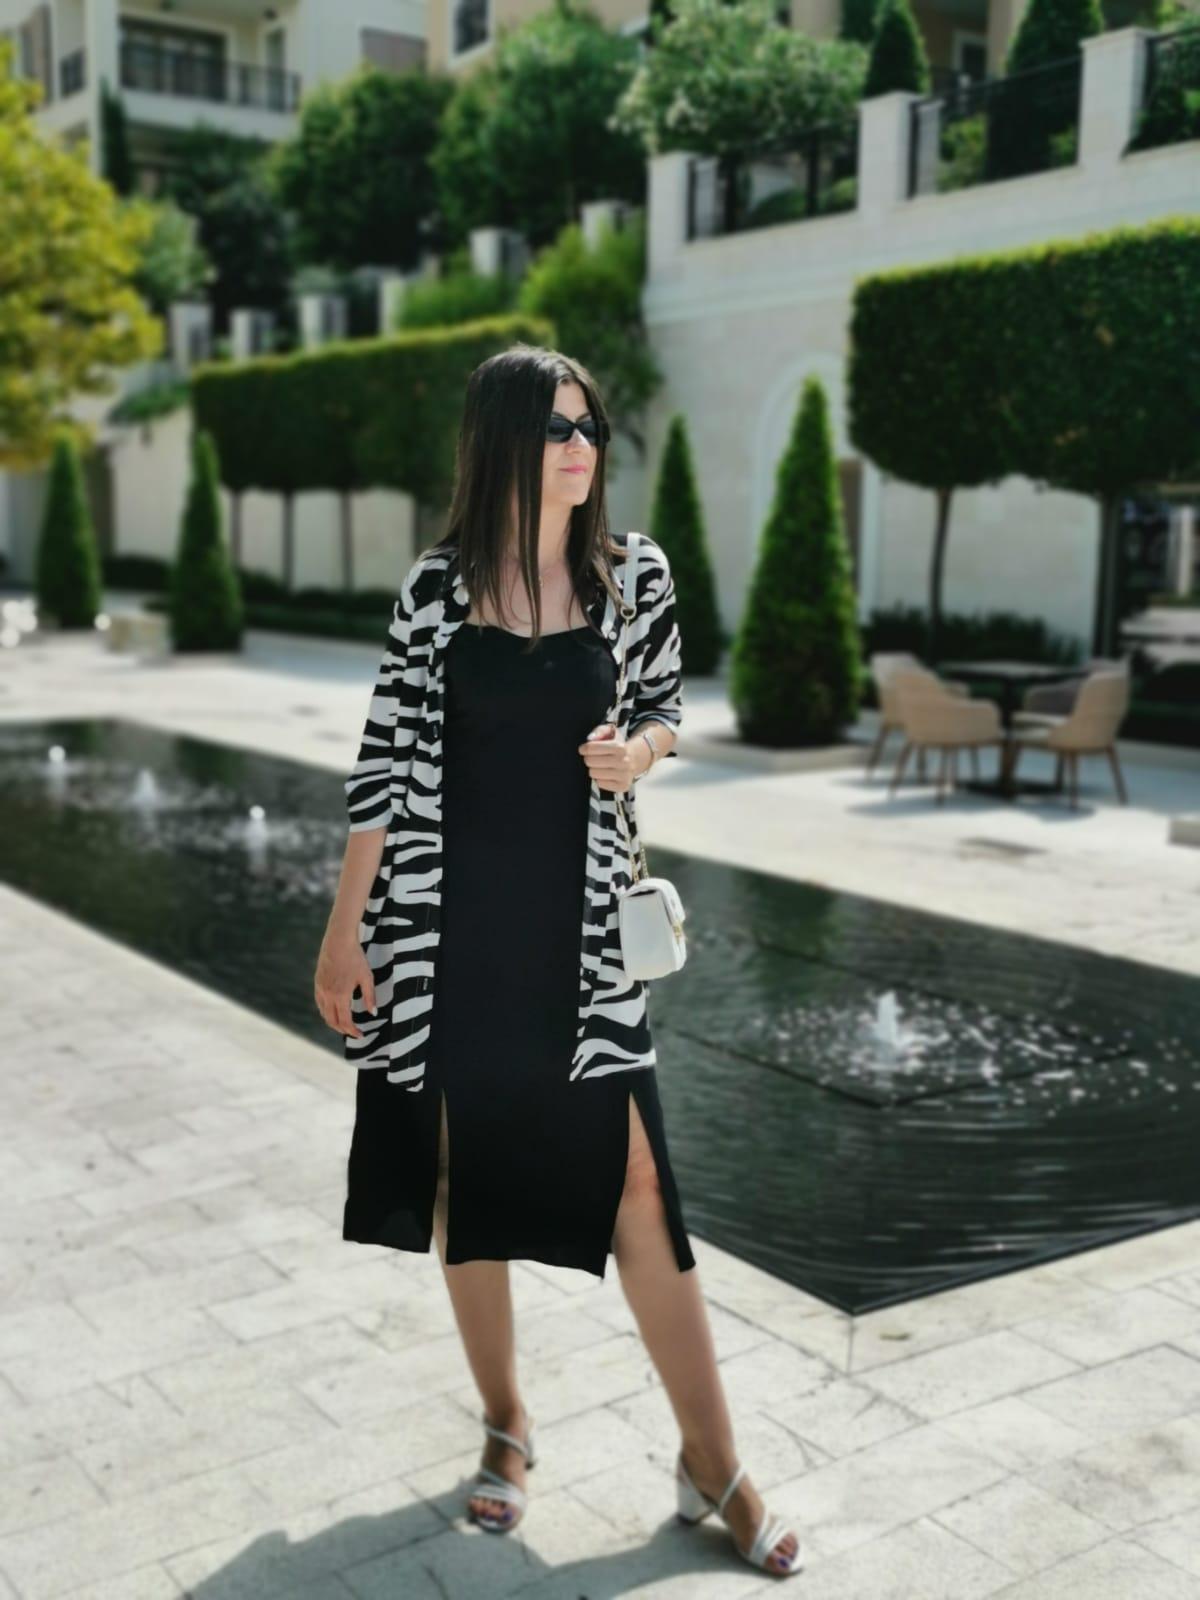 zebra print outfit idea